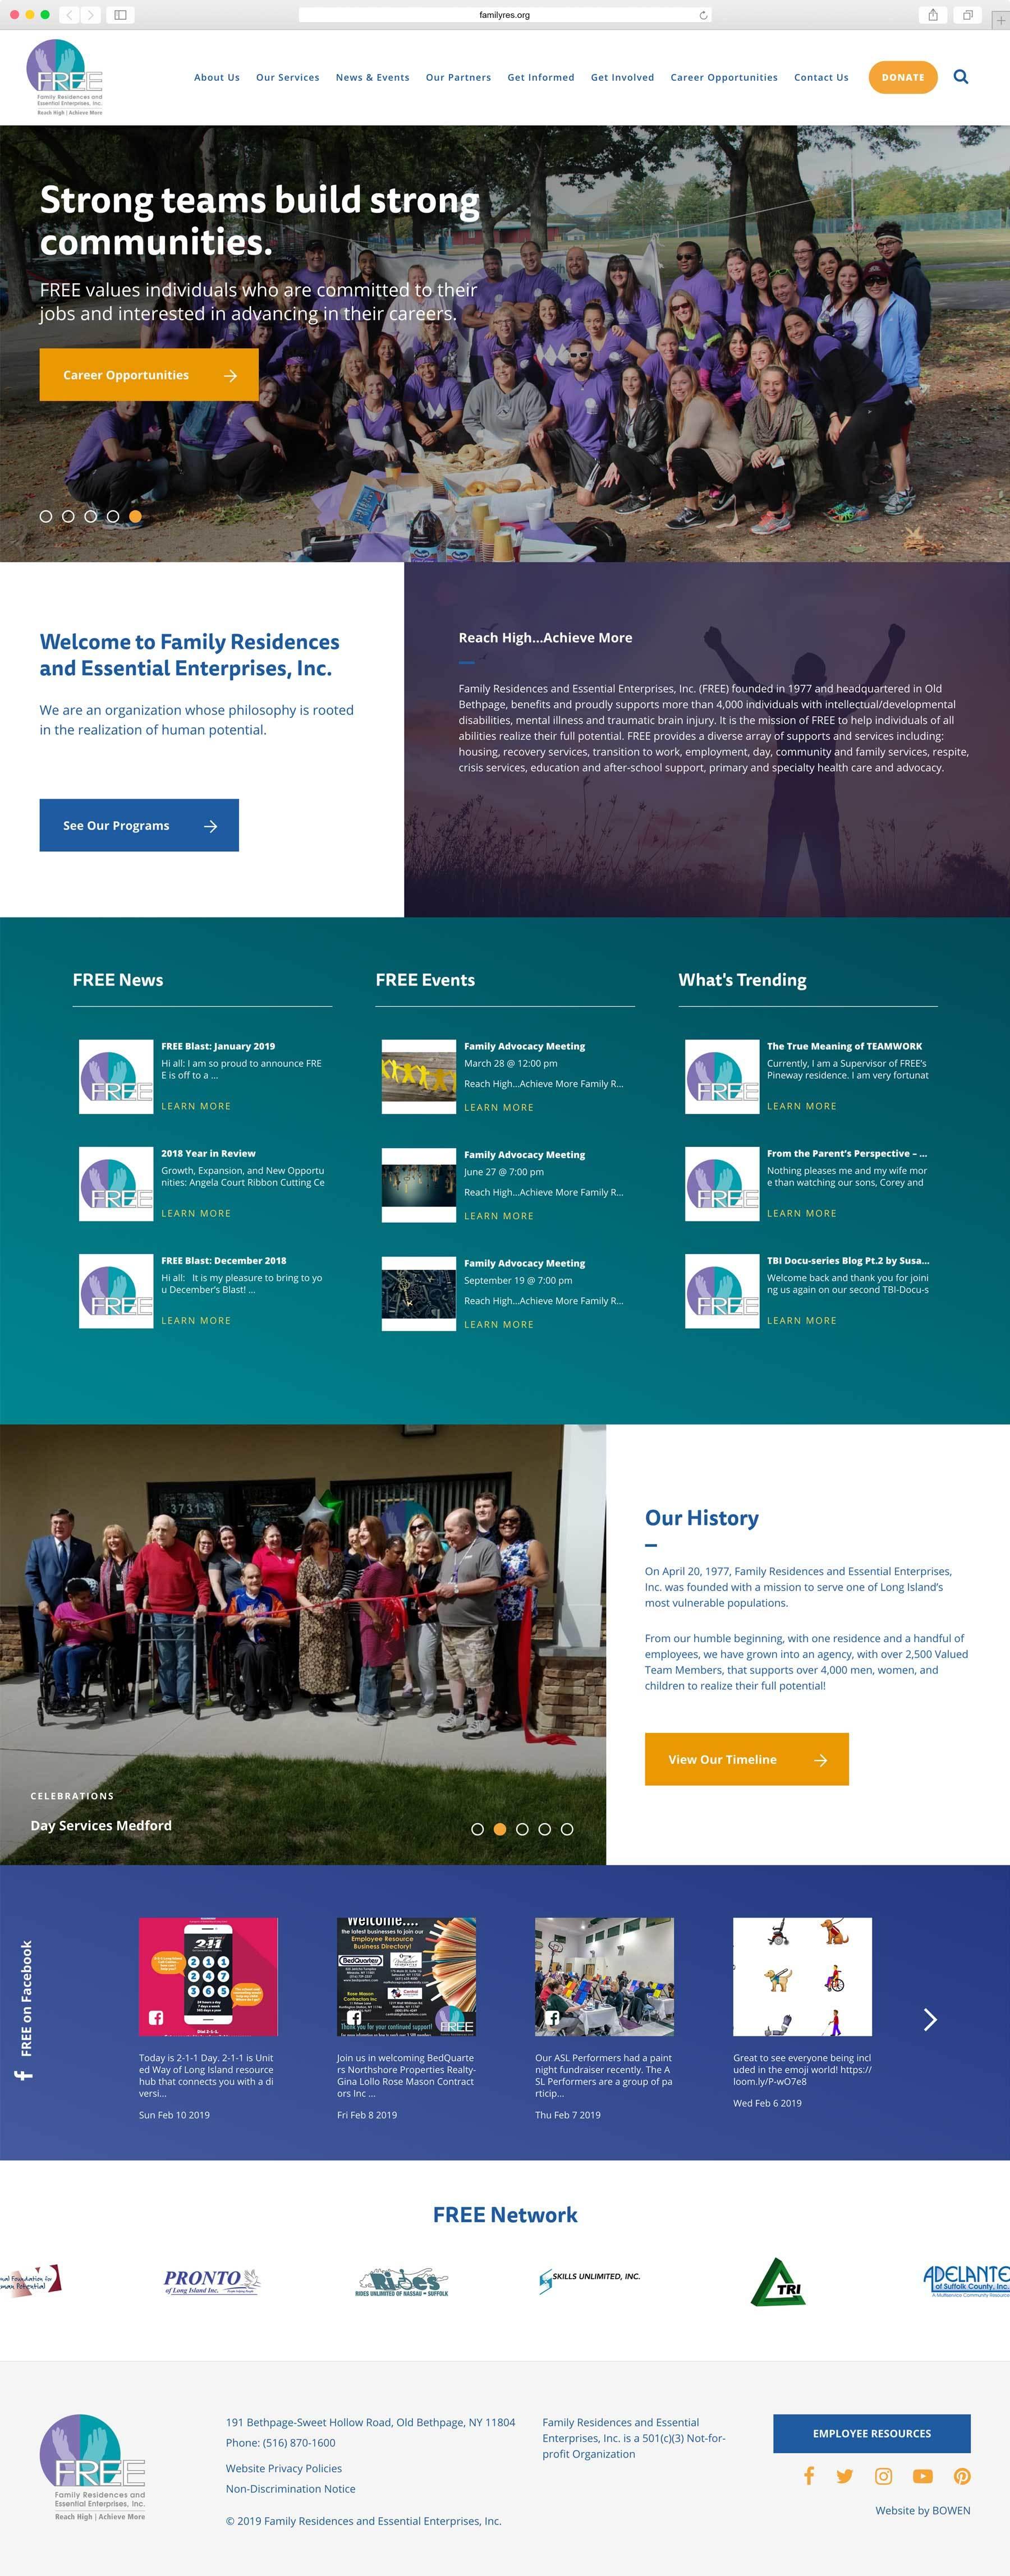 Branding services, brand identity design, branding and marketing, branding agency